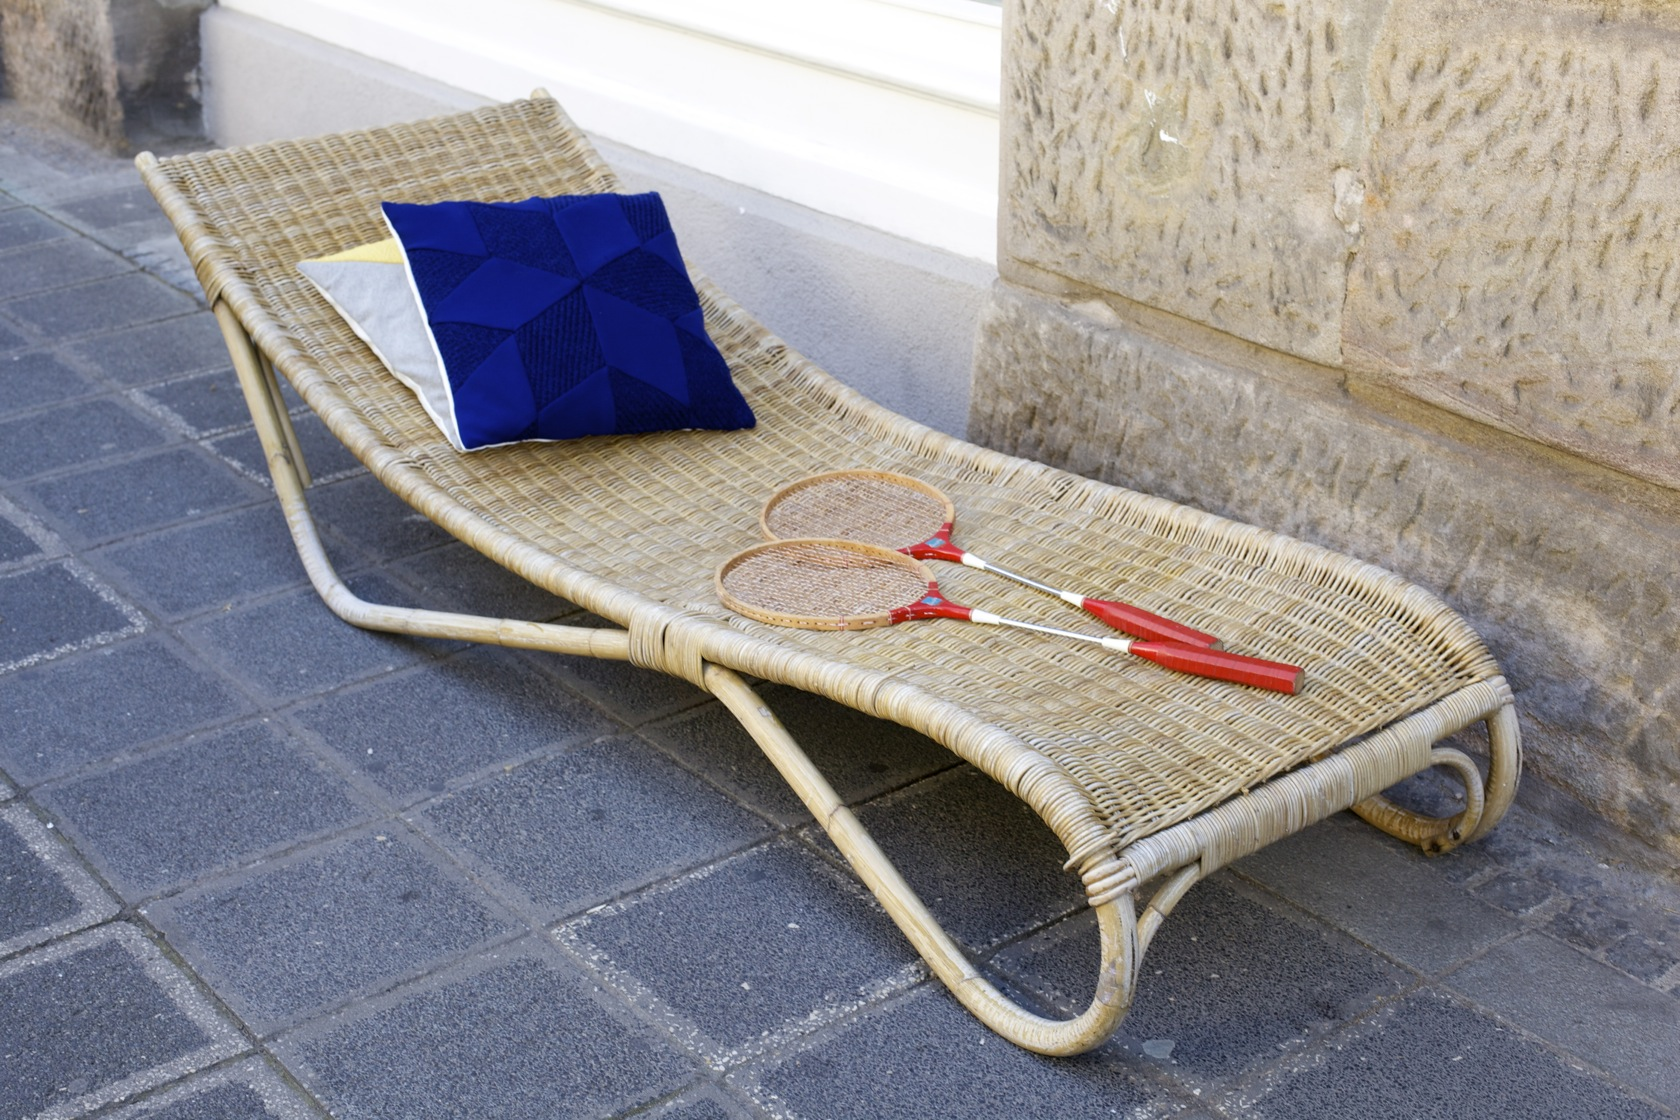 rattanliege der 50er jahre raumwunder vintage wohnen in n rnberg. Black Bedroom Furniture Sets. Home Design Ideas